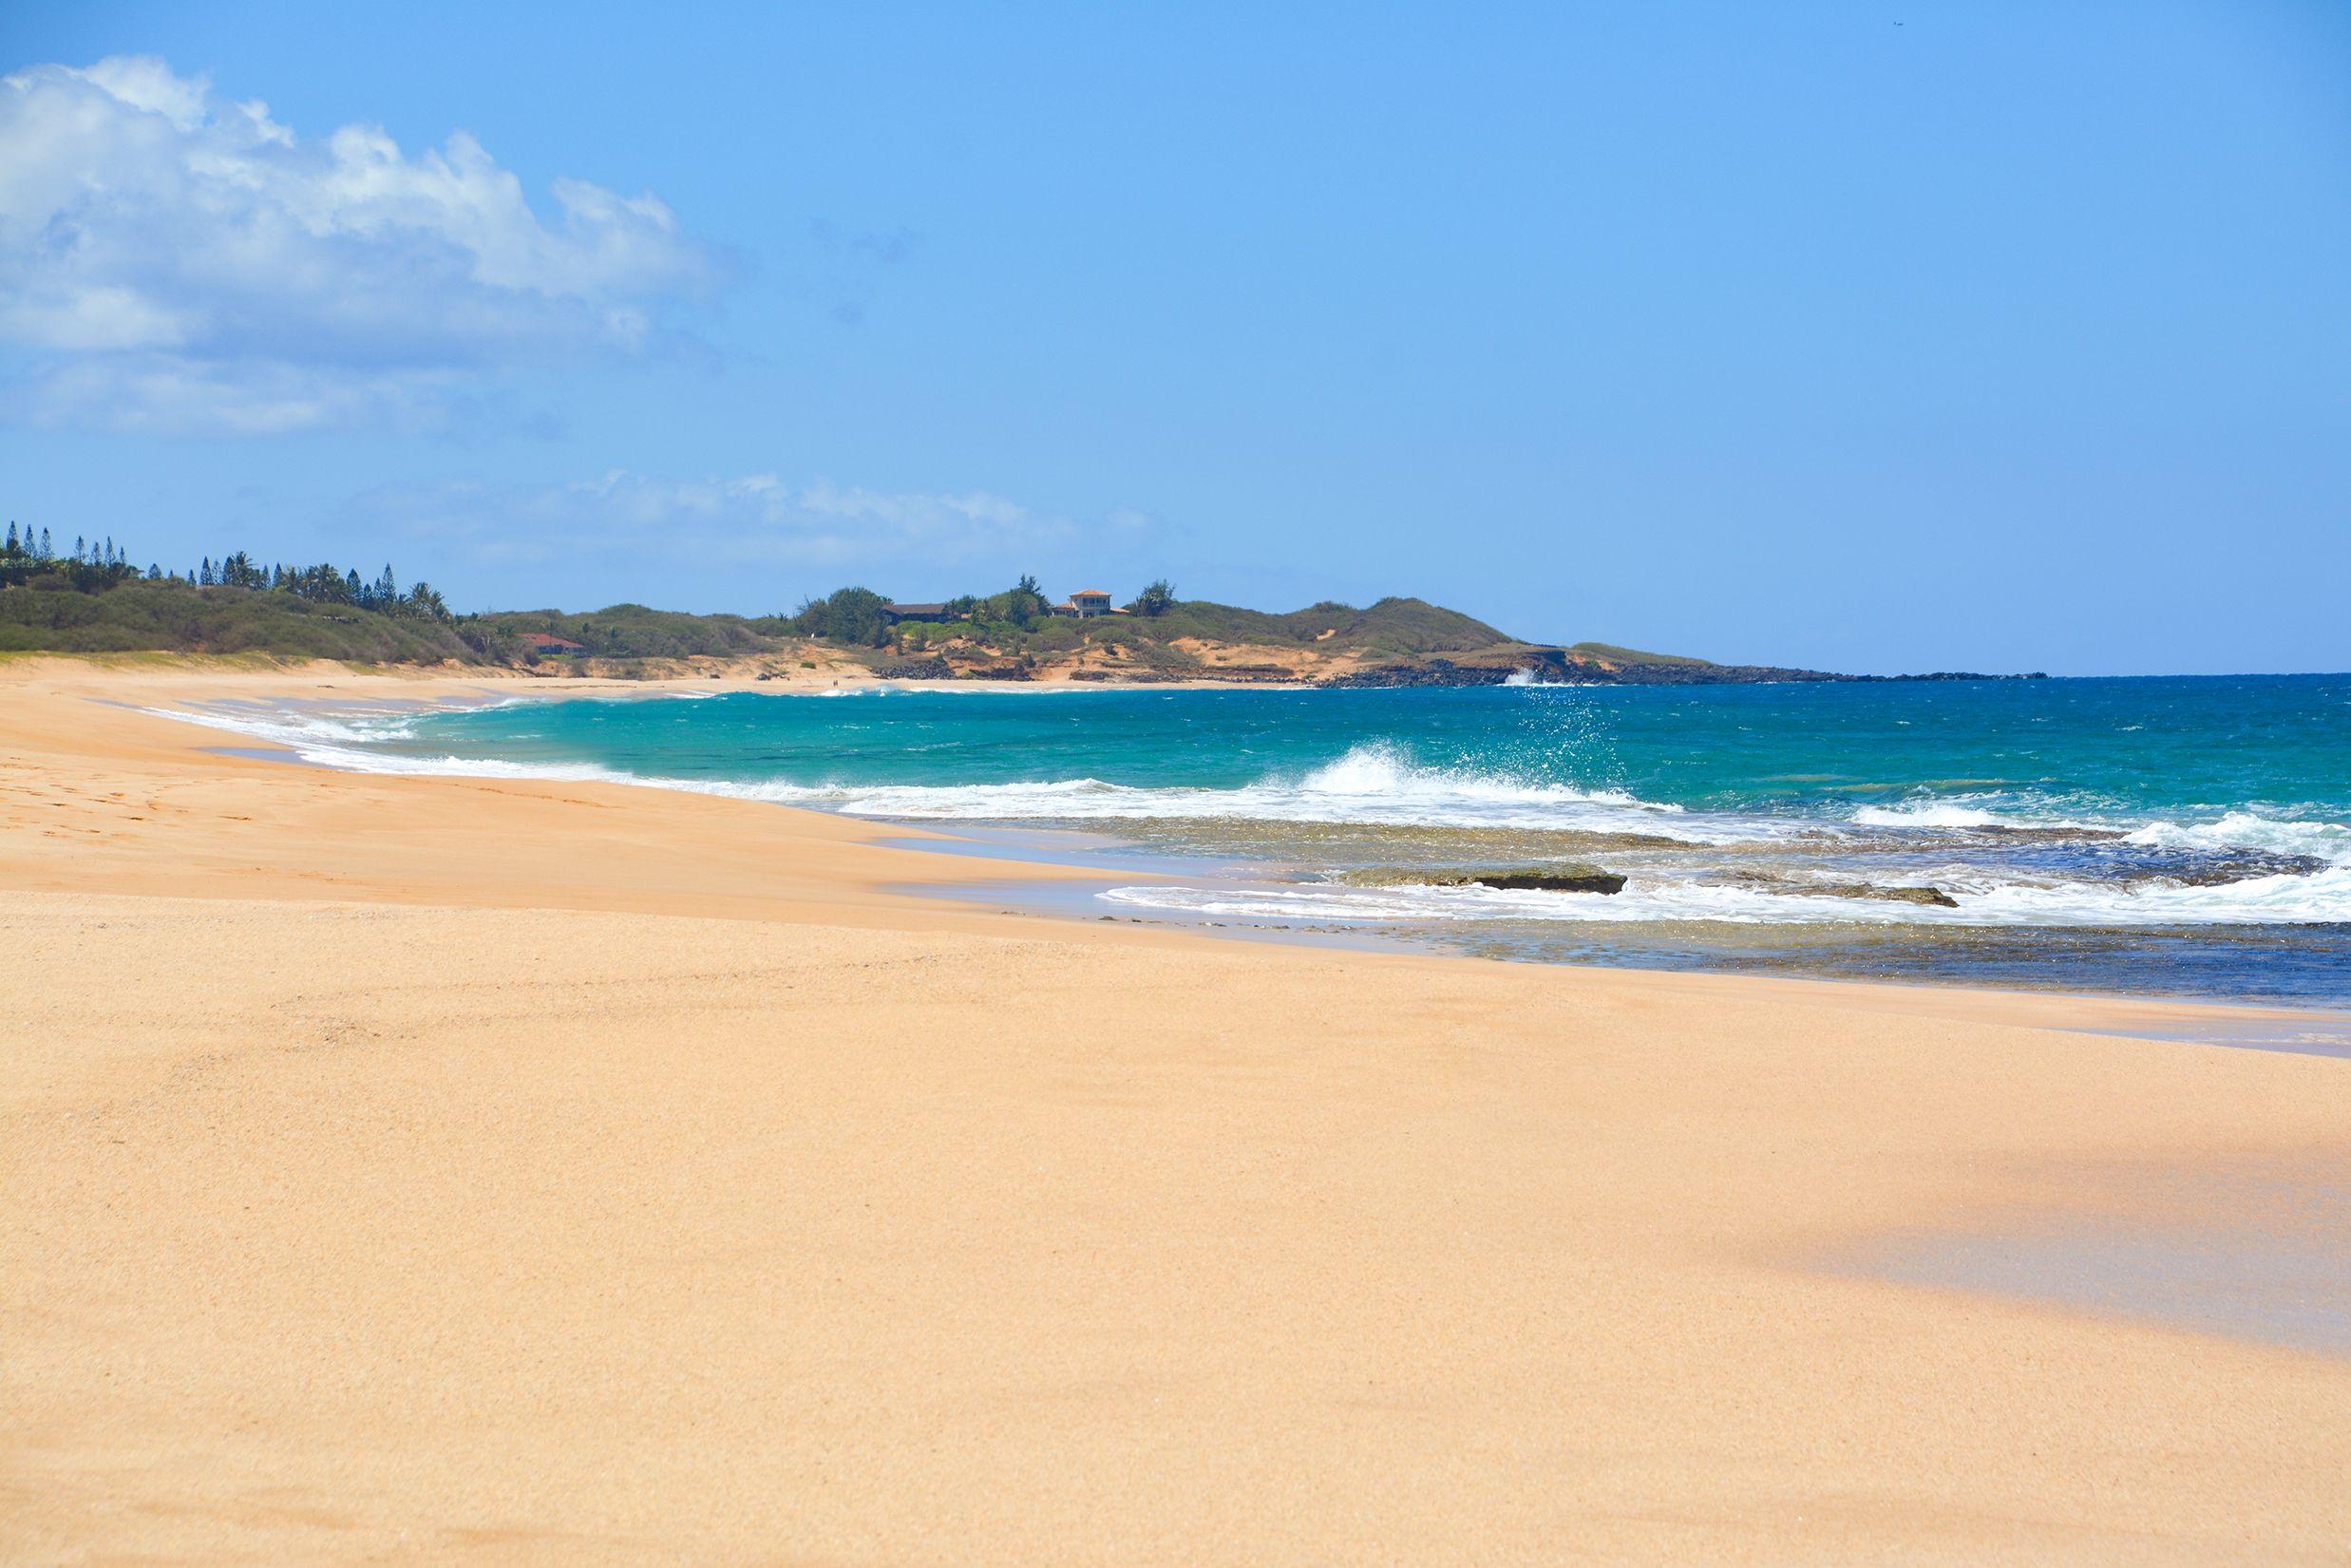 Am Papohaku Beach auf der Insel Molokai, Hawaii